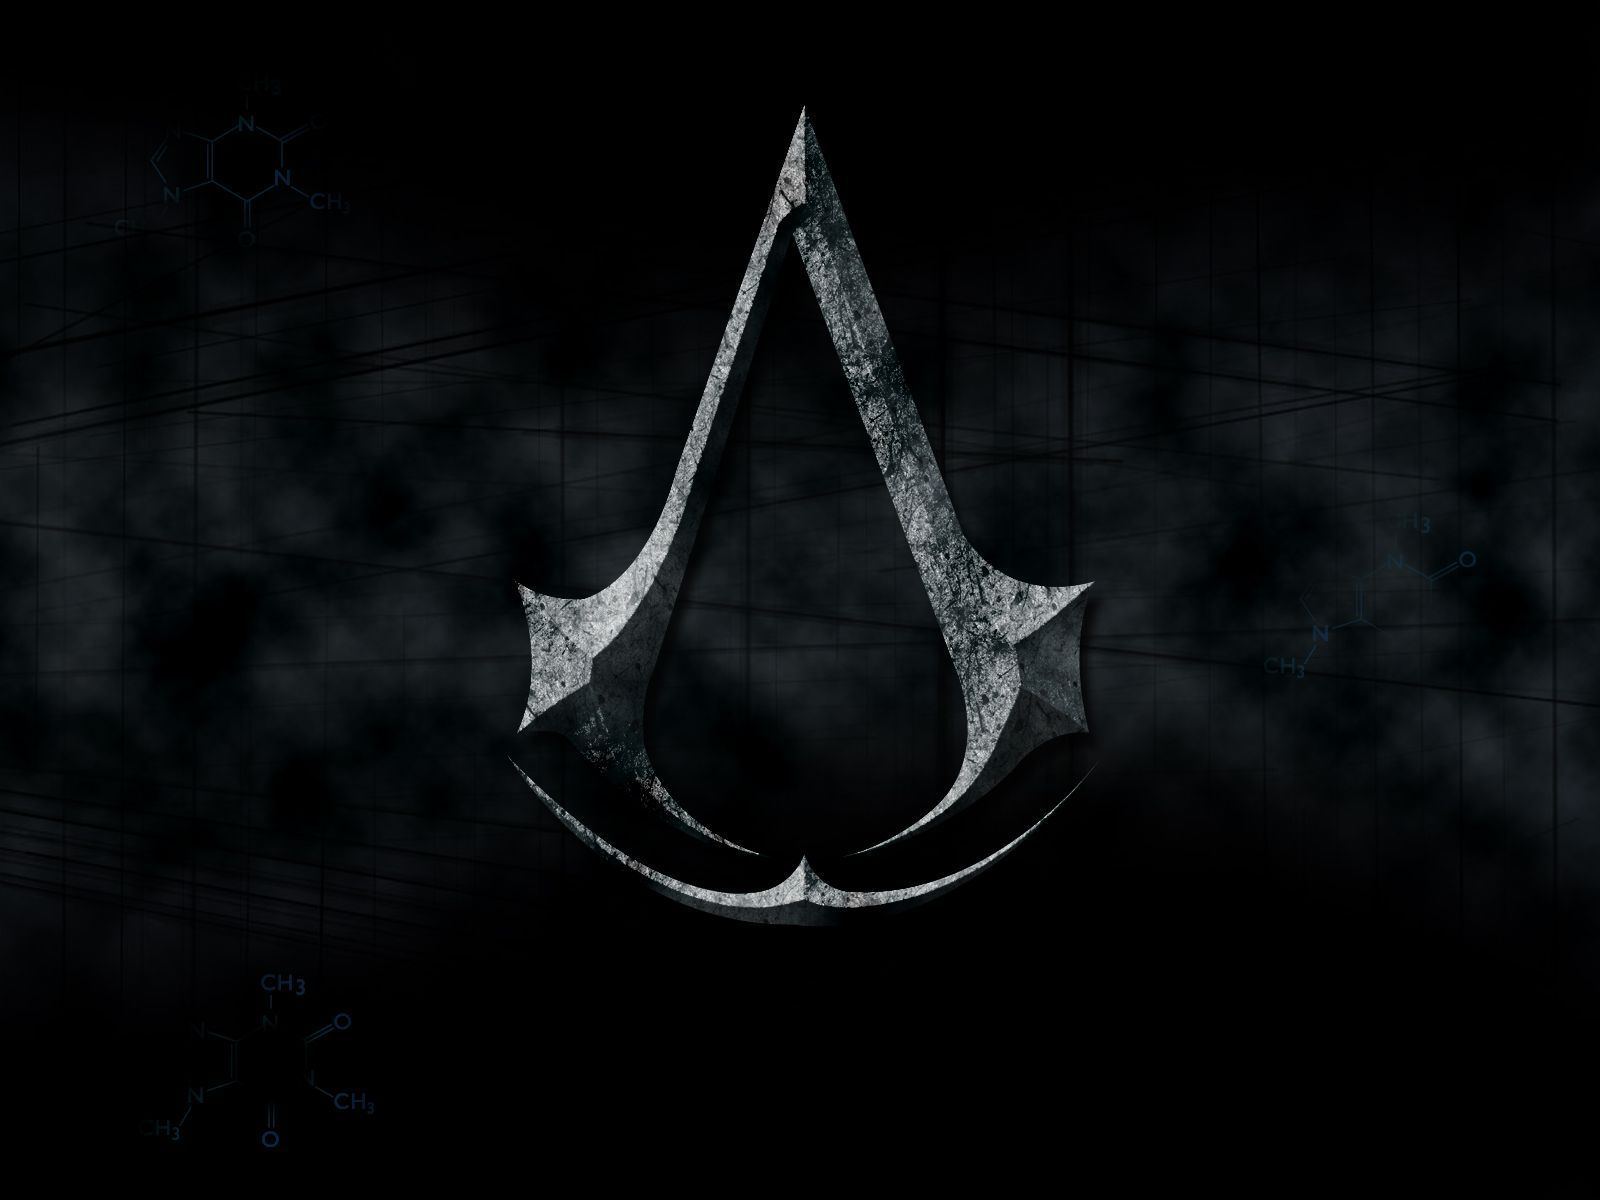 Assassins Creed Wallpapers HD Wallpaper 1920×1080 Assassin